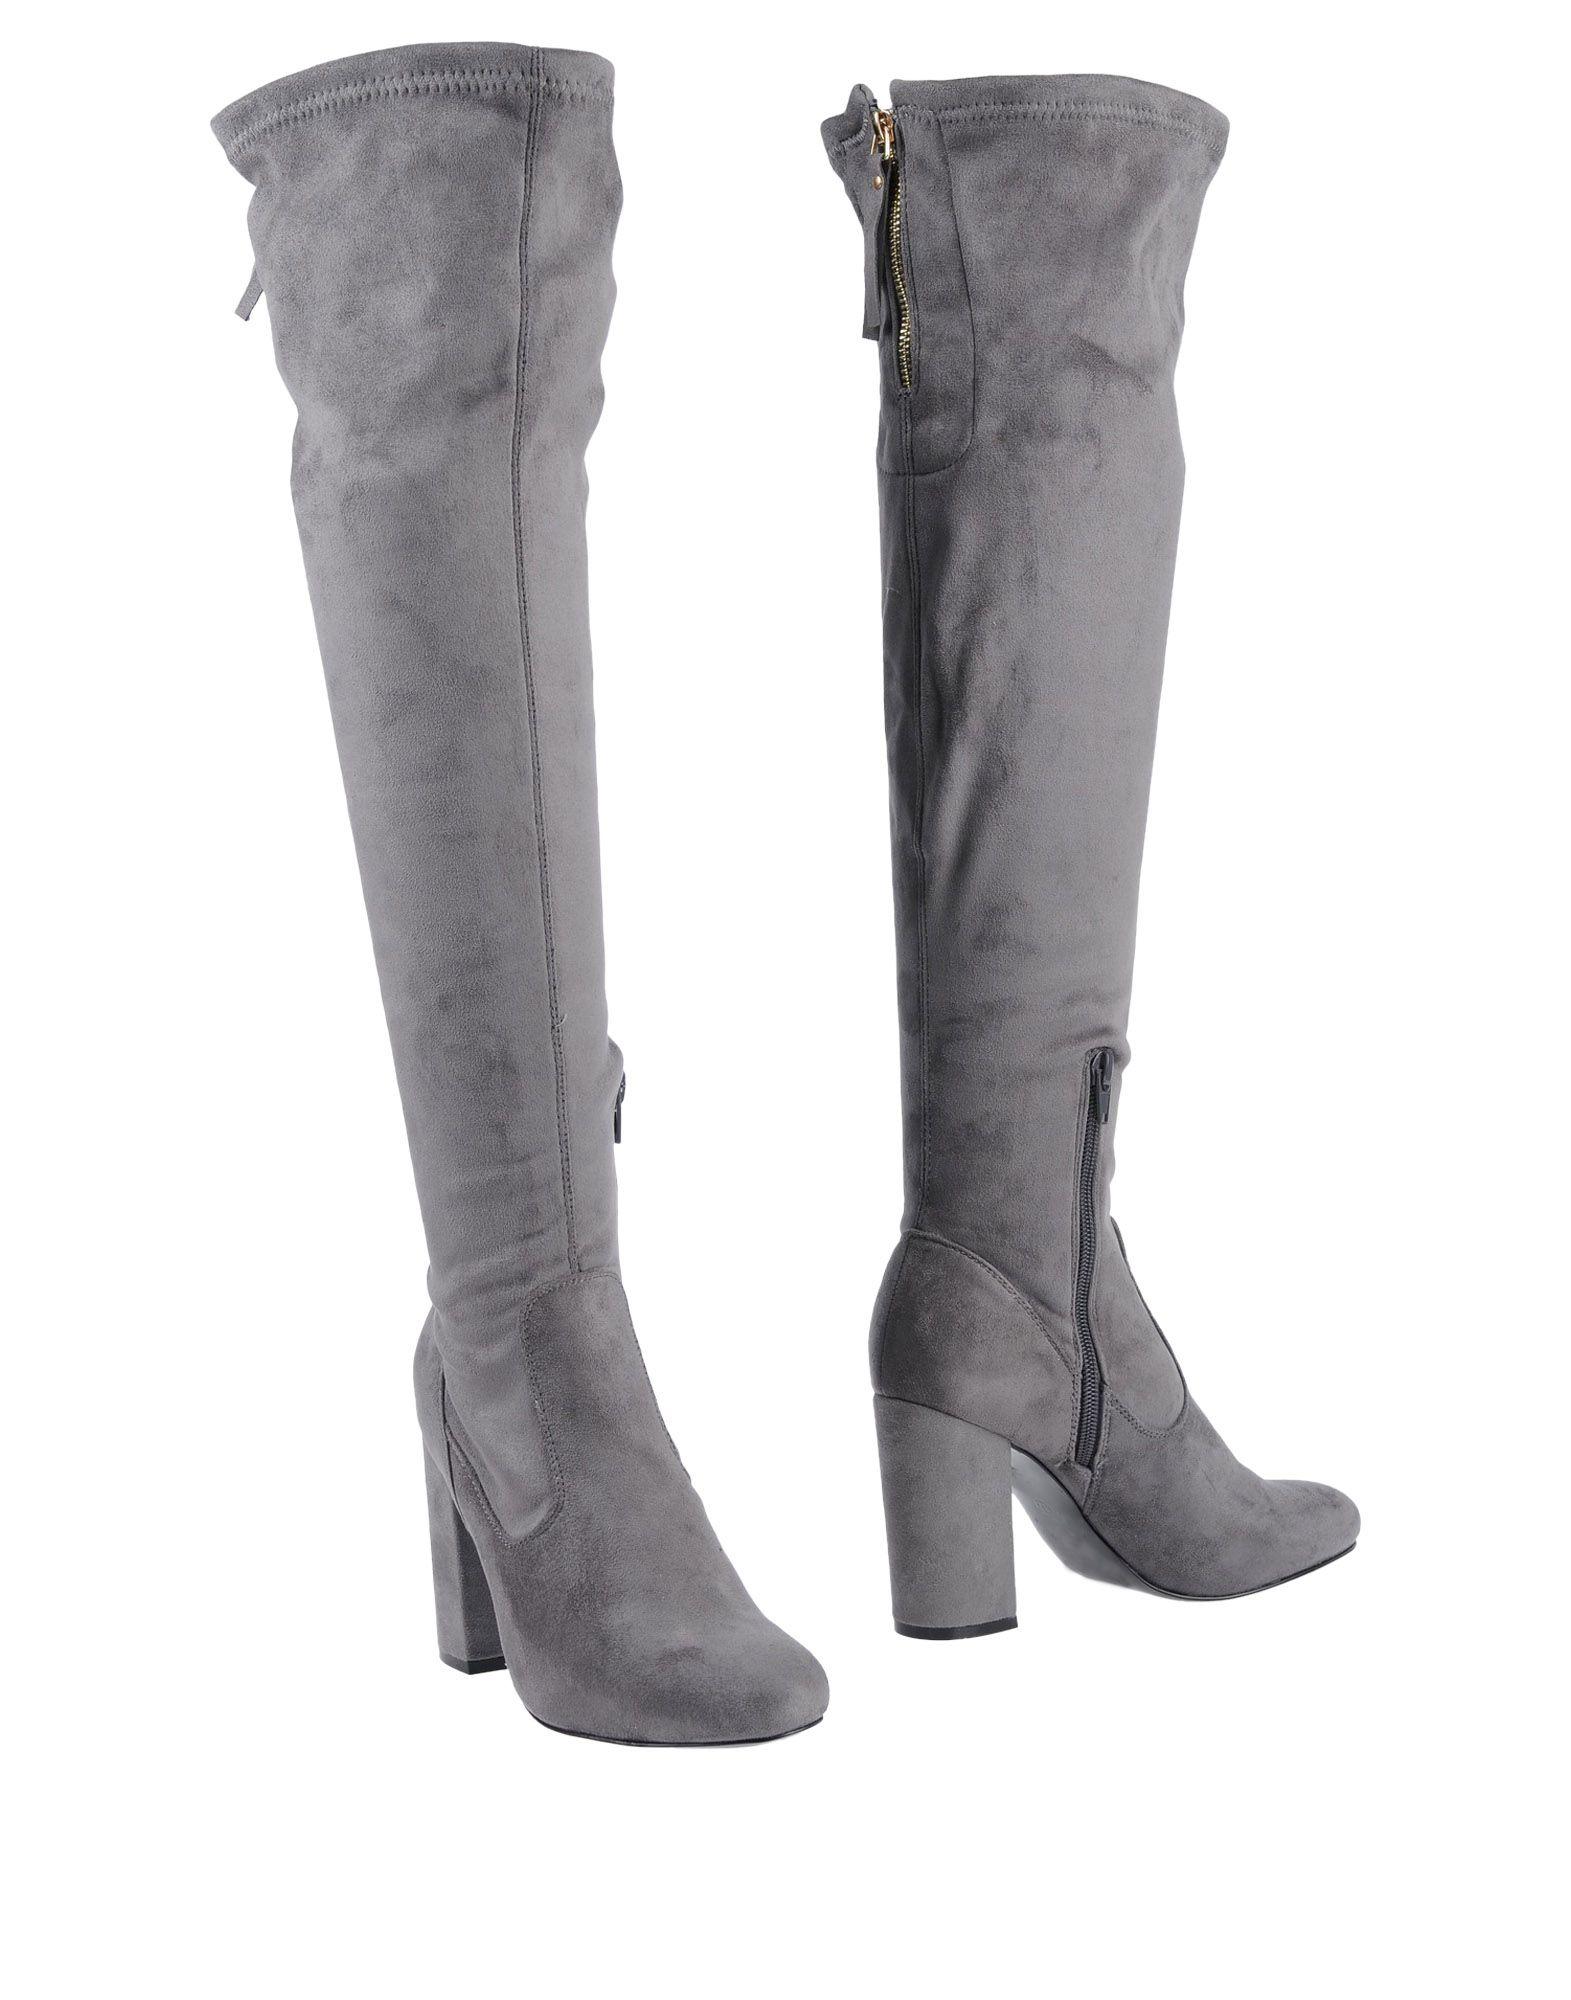 Exe' Stiefel Damen  11467077FF Gute Gute Gute Qualität beliebte Schuhe c94cfb